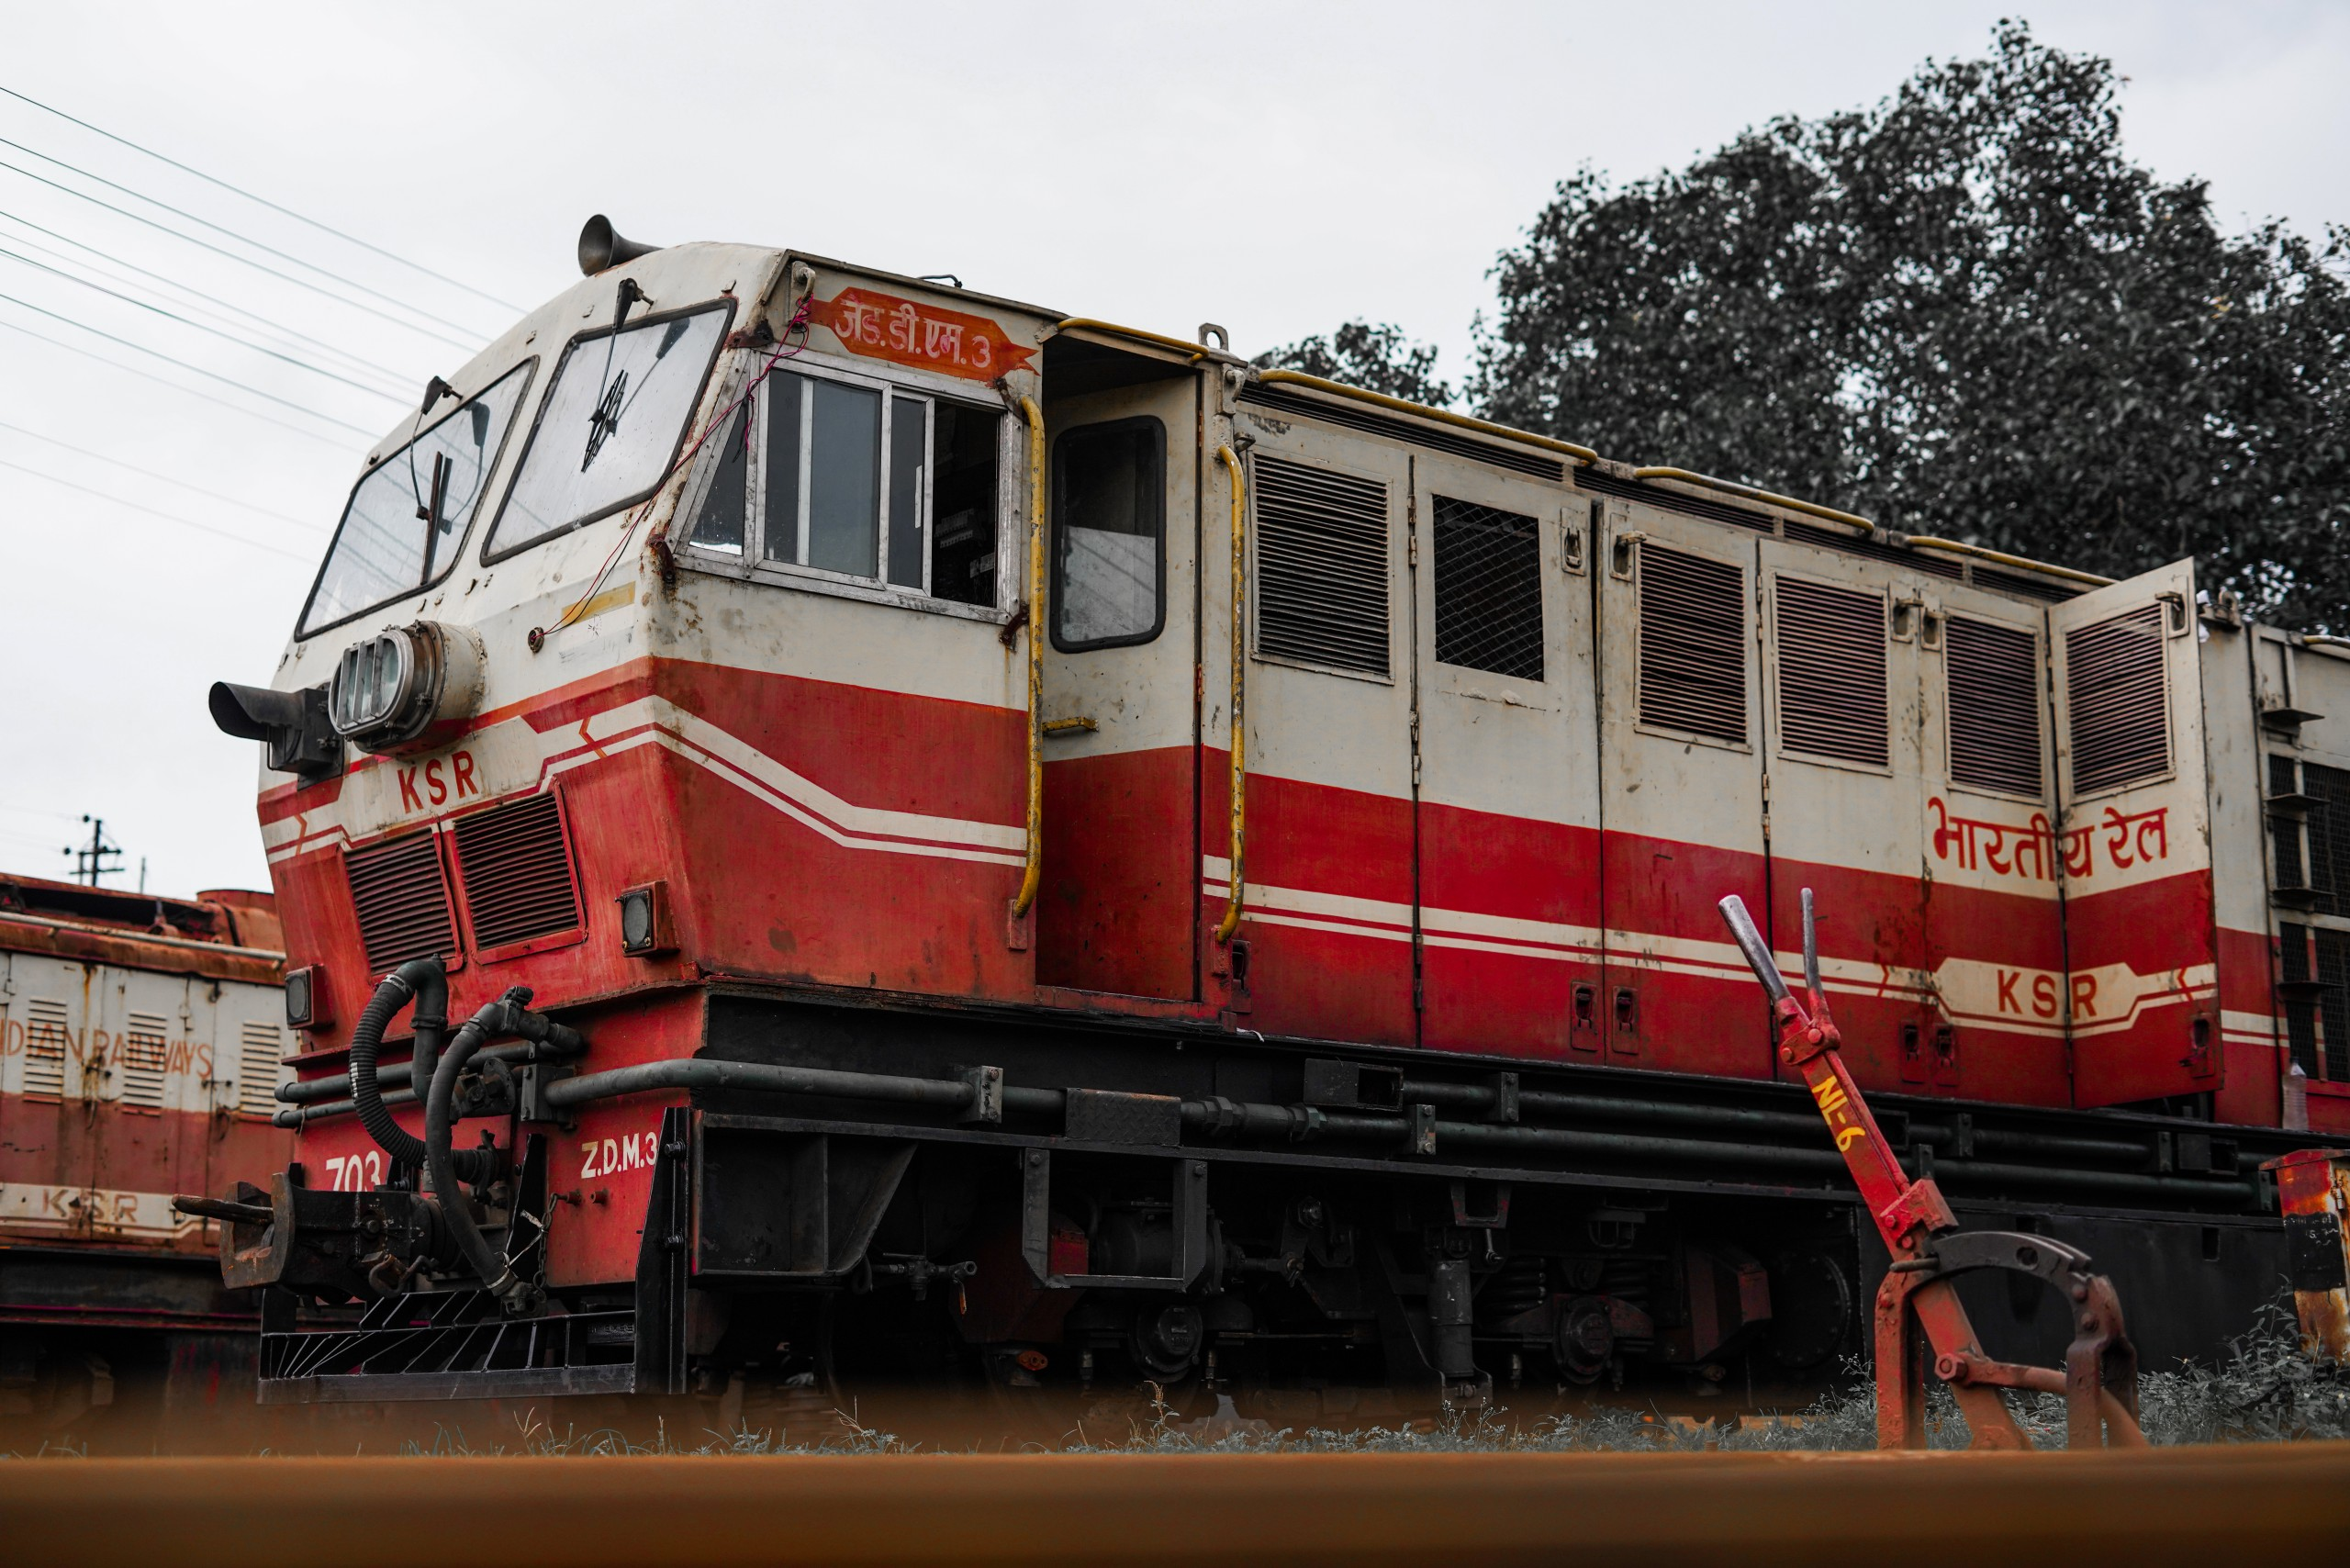 One Indian Rail Engine